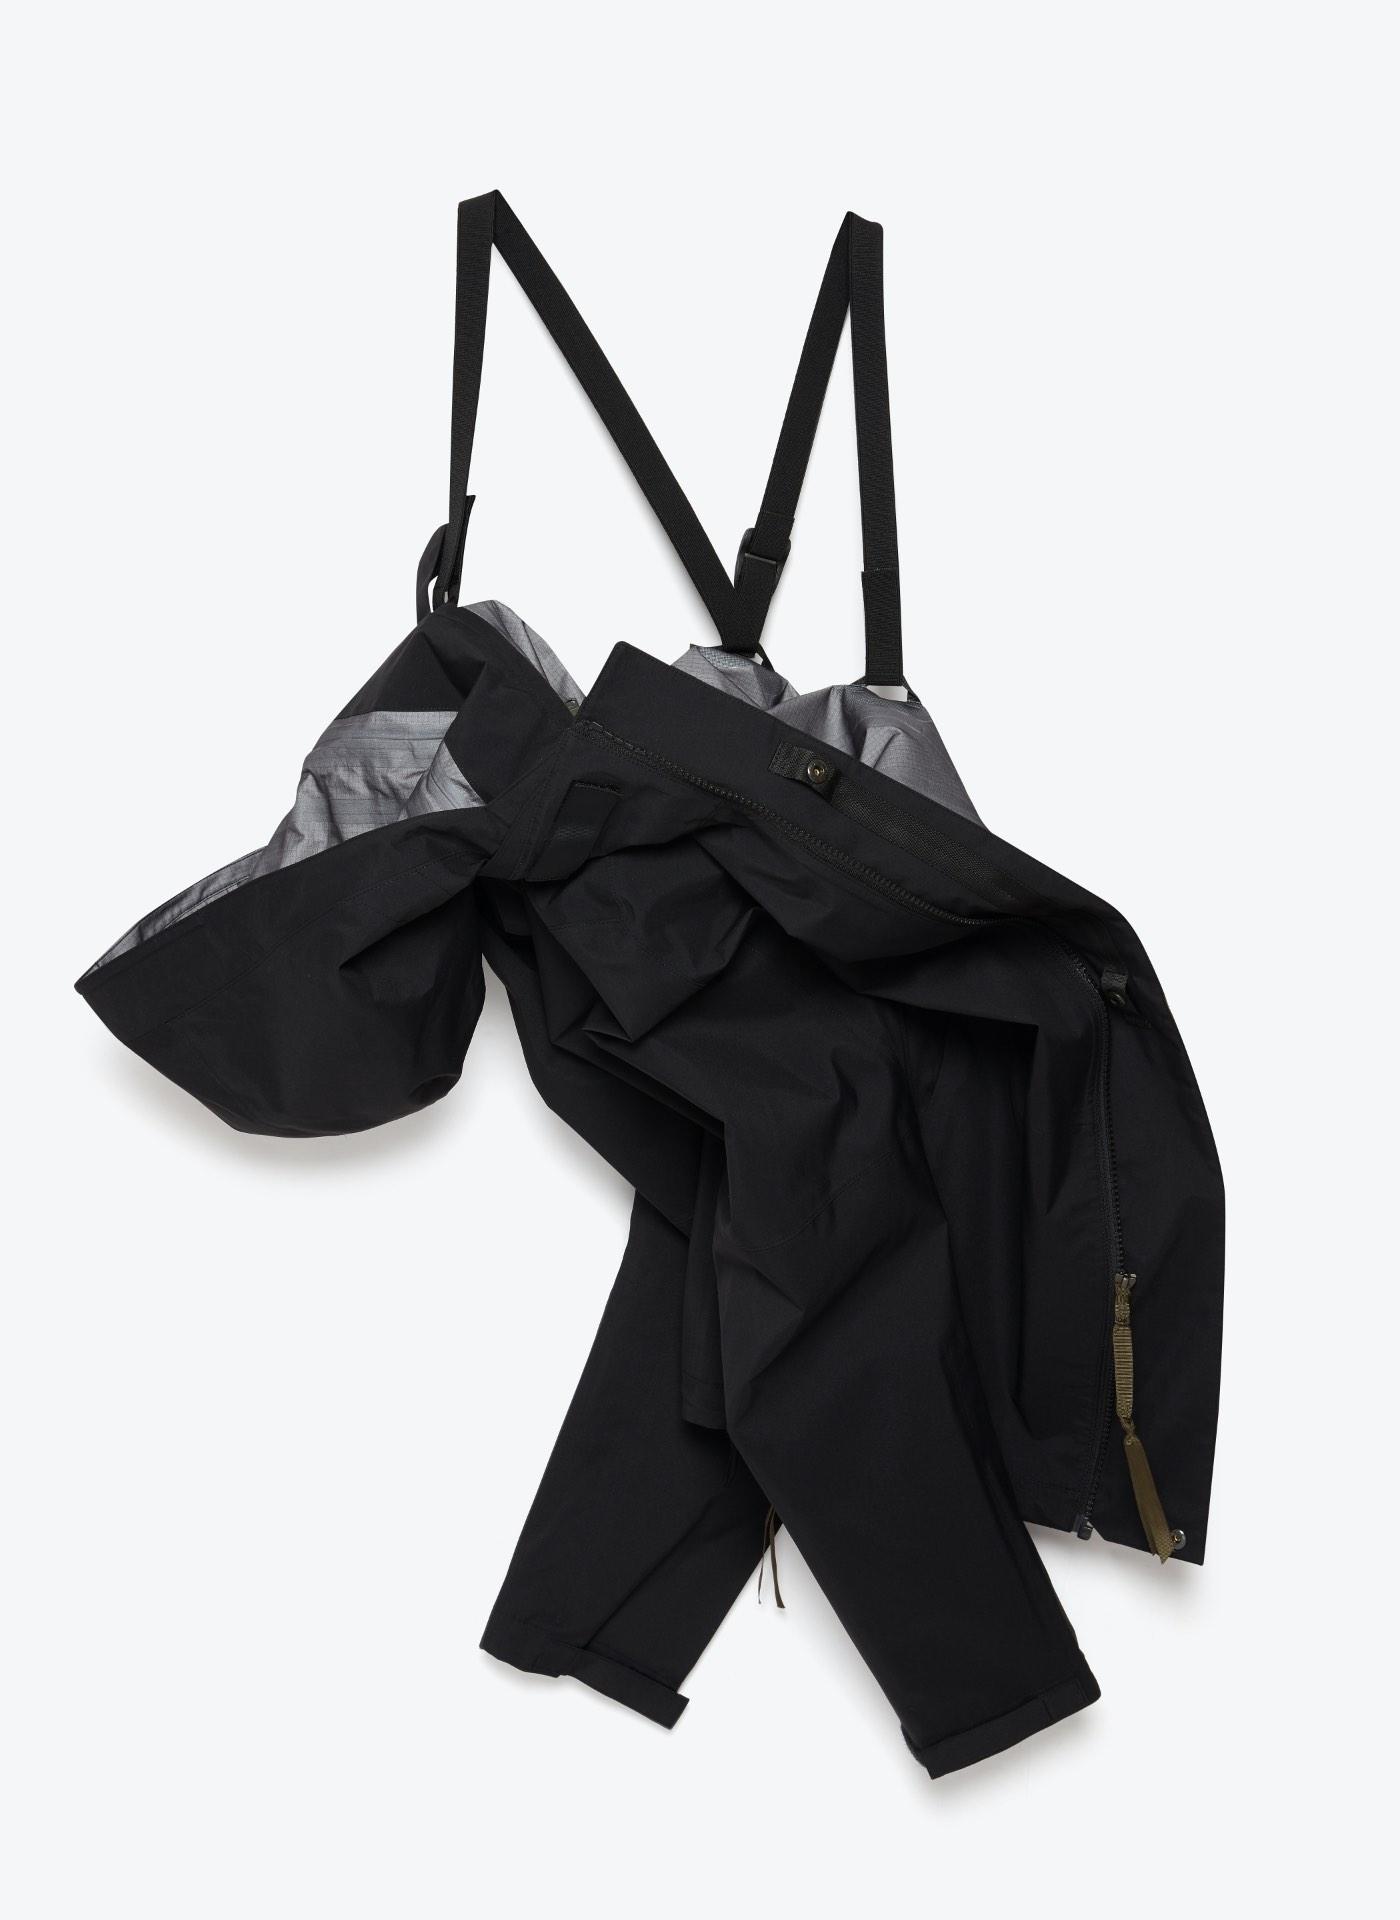 creative shot of a hanging black and grey coat jacket